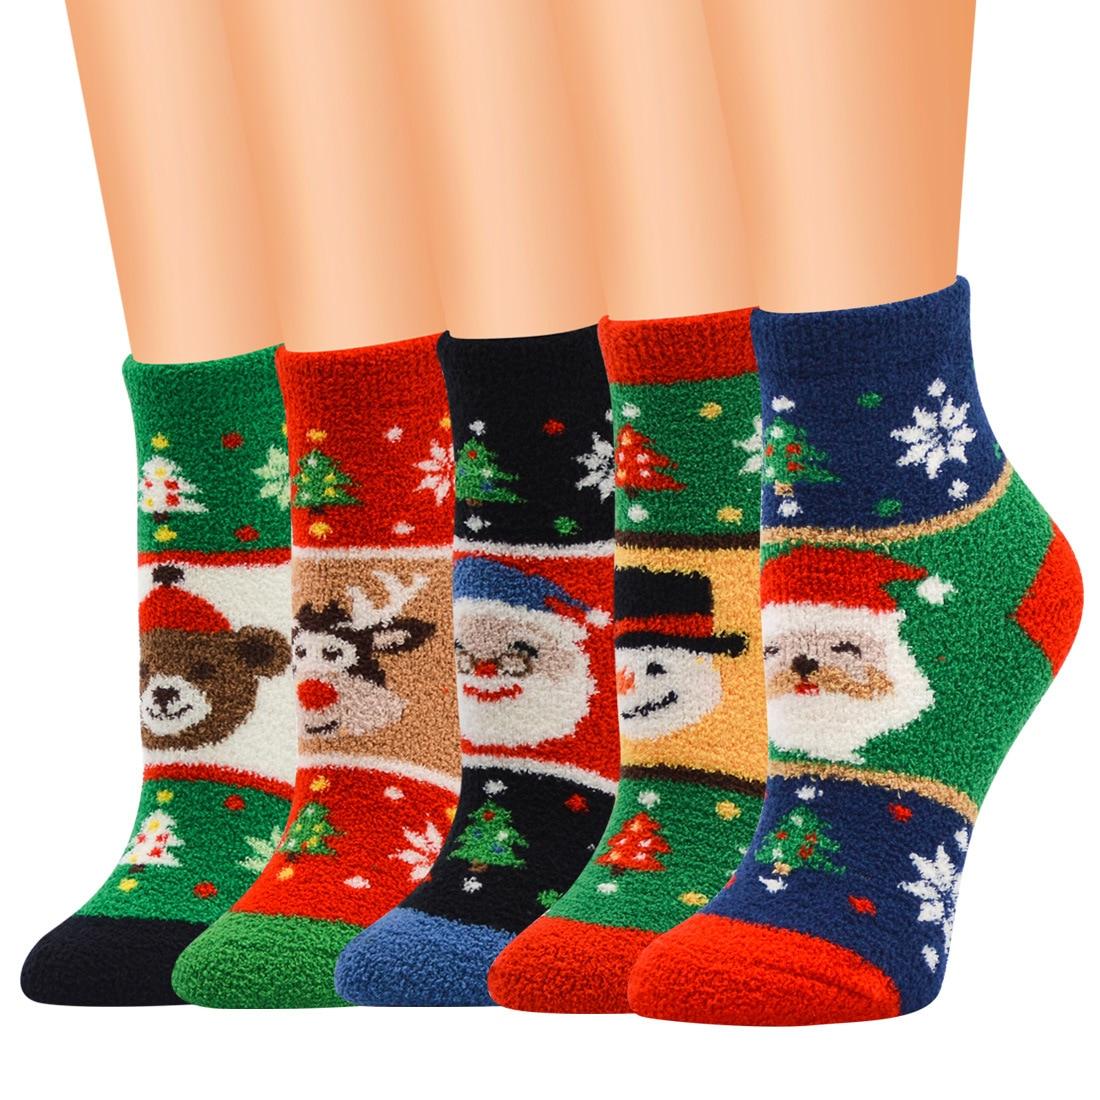 Ladies Thermal Socks Multi Pattern Design 4-7 Womens Winter Extra Warmth 3 Pairs